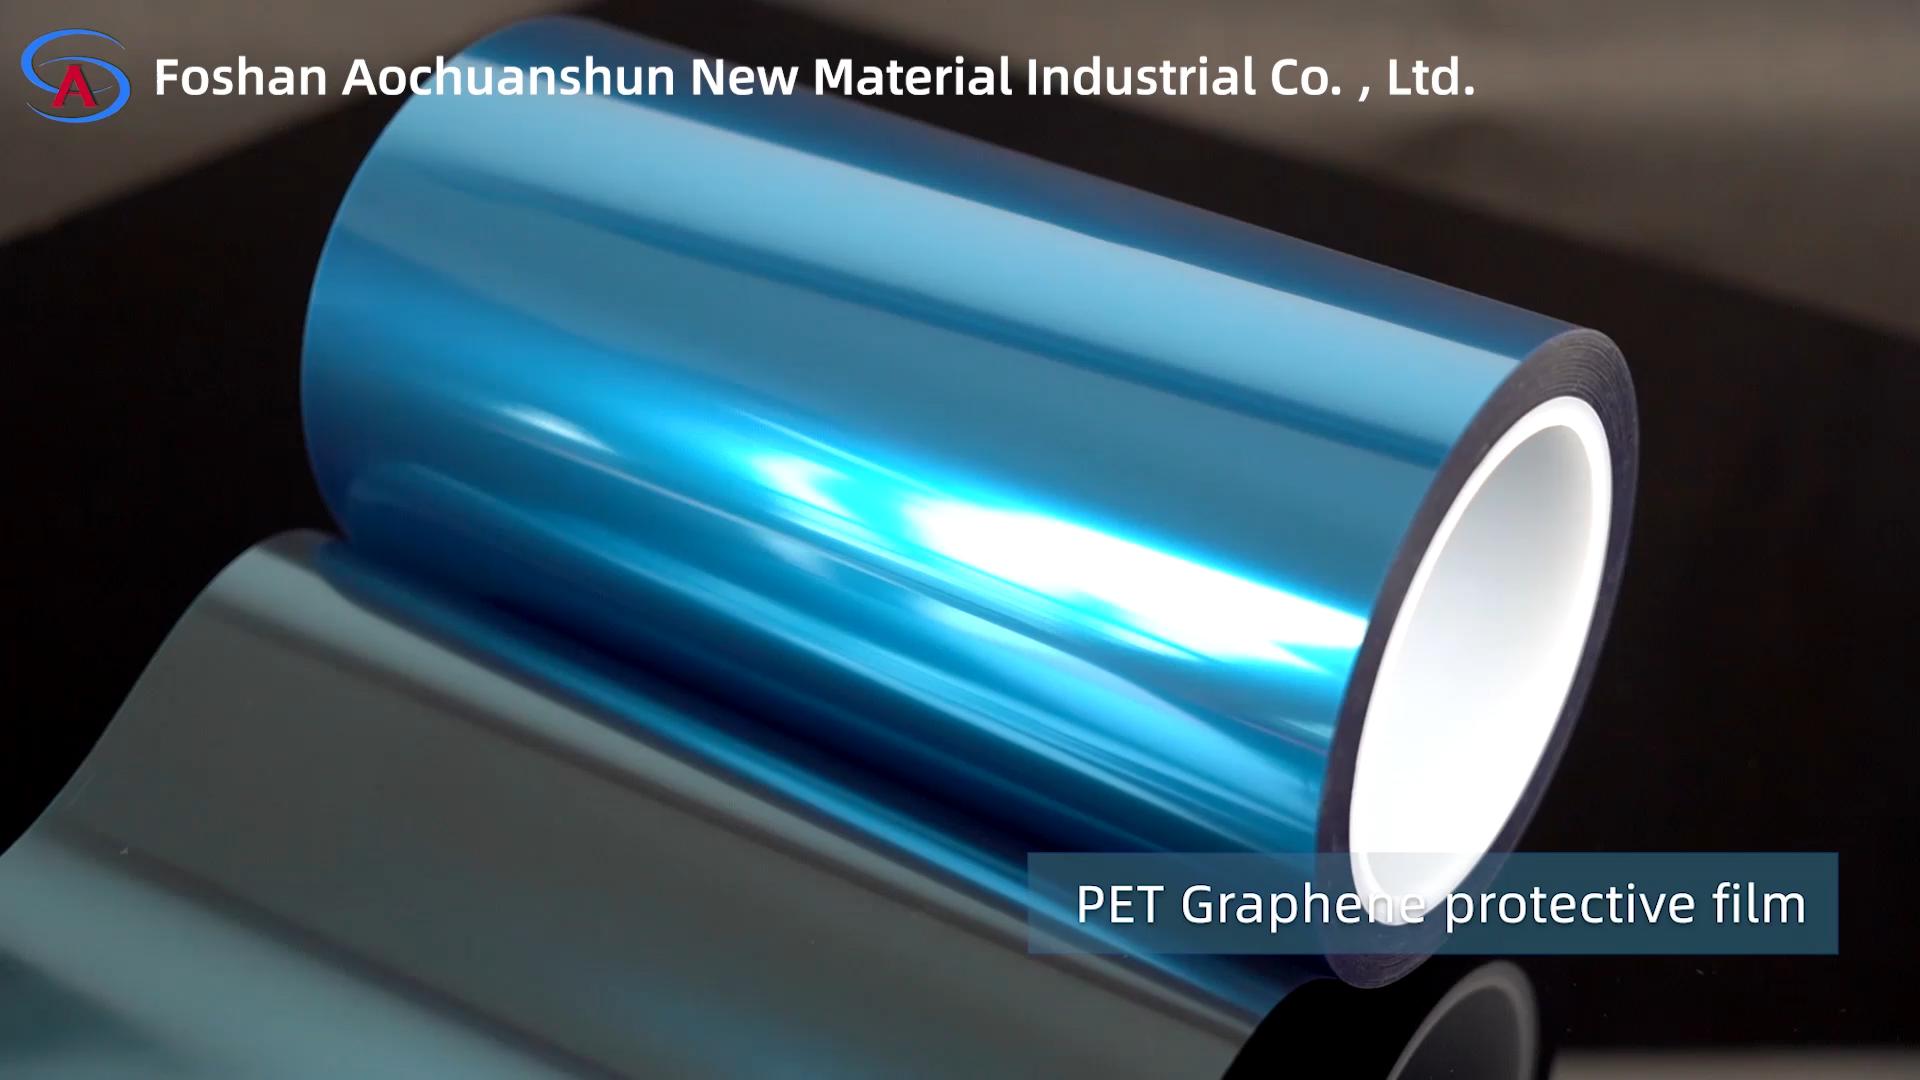 Hohe qualität silikon beschichtet graphene lithium-batterie pet blau schutzhülle film